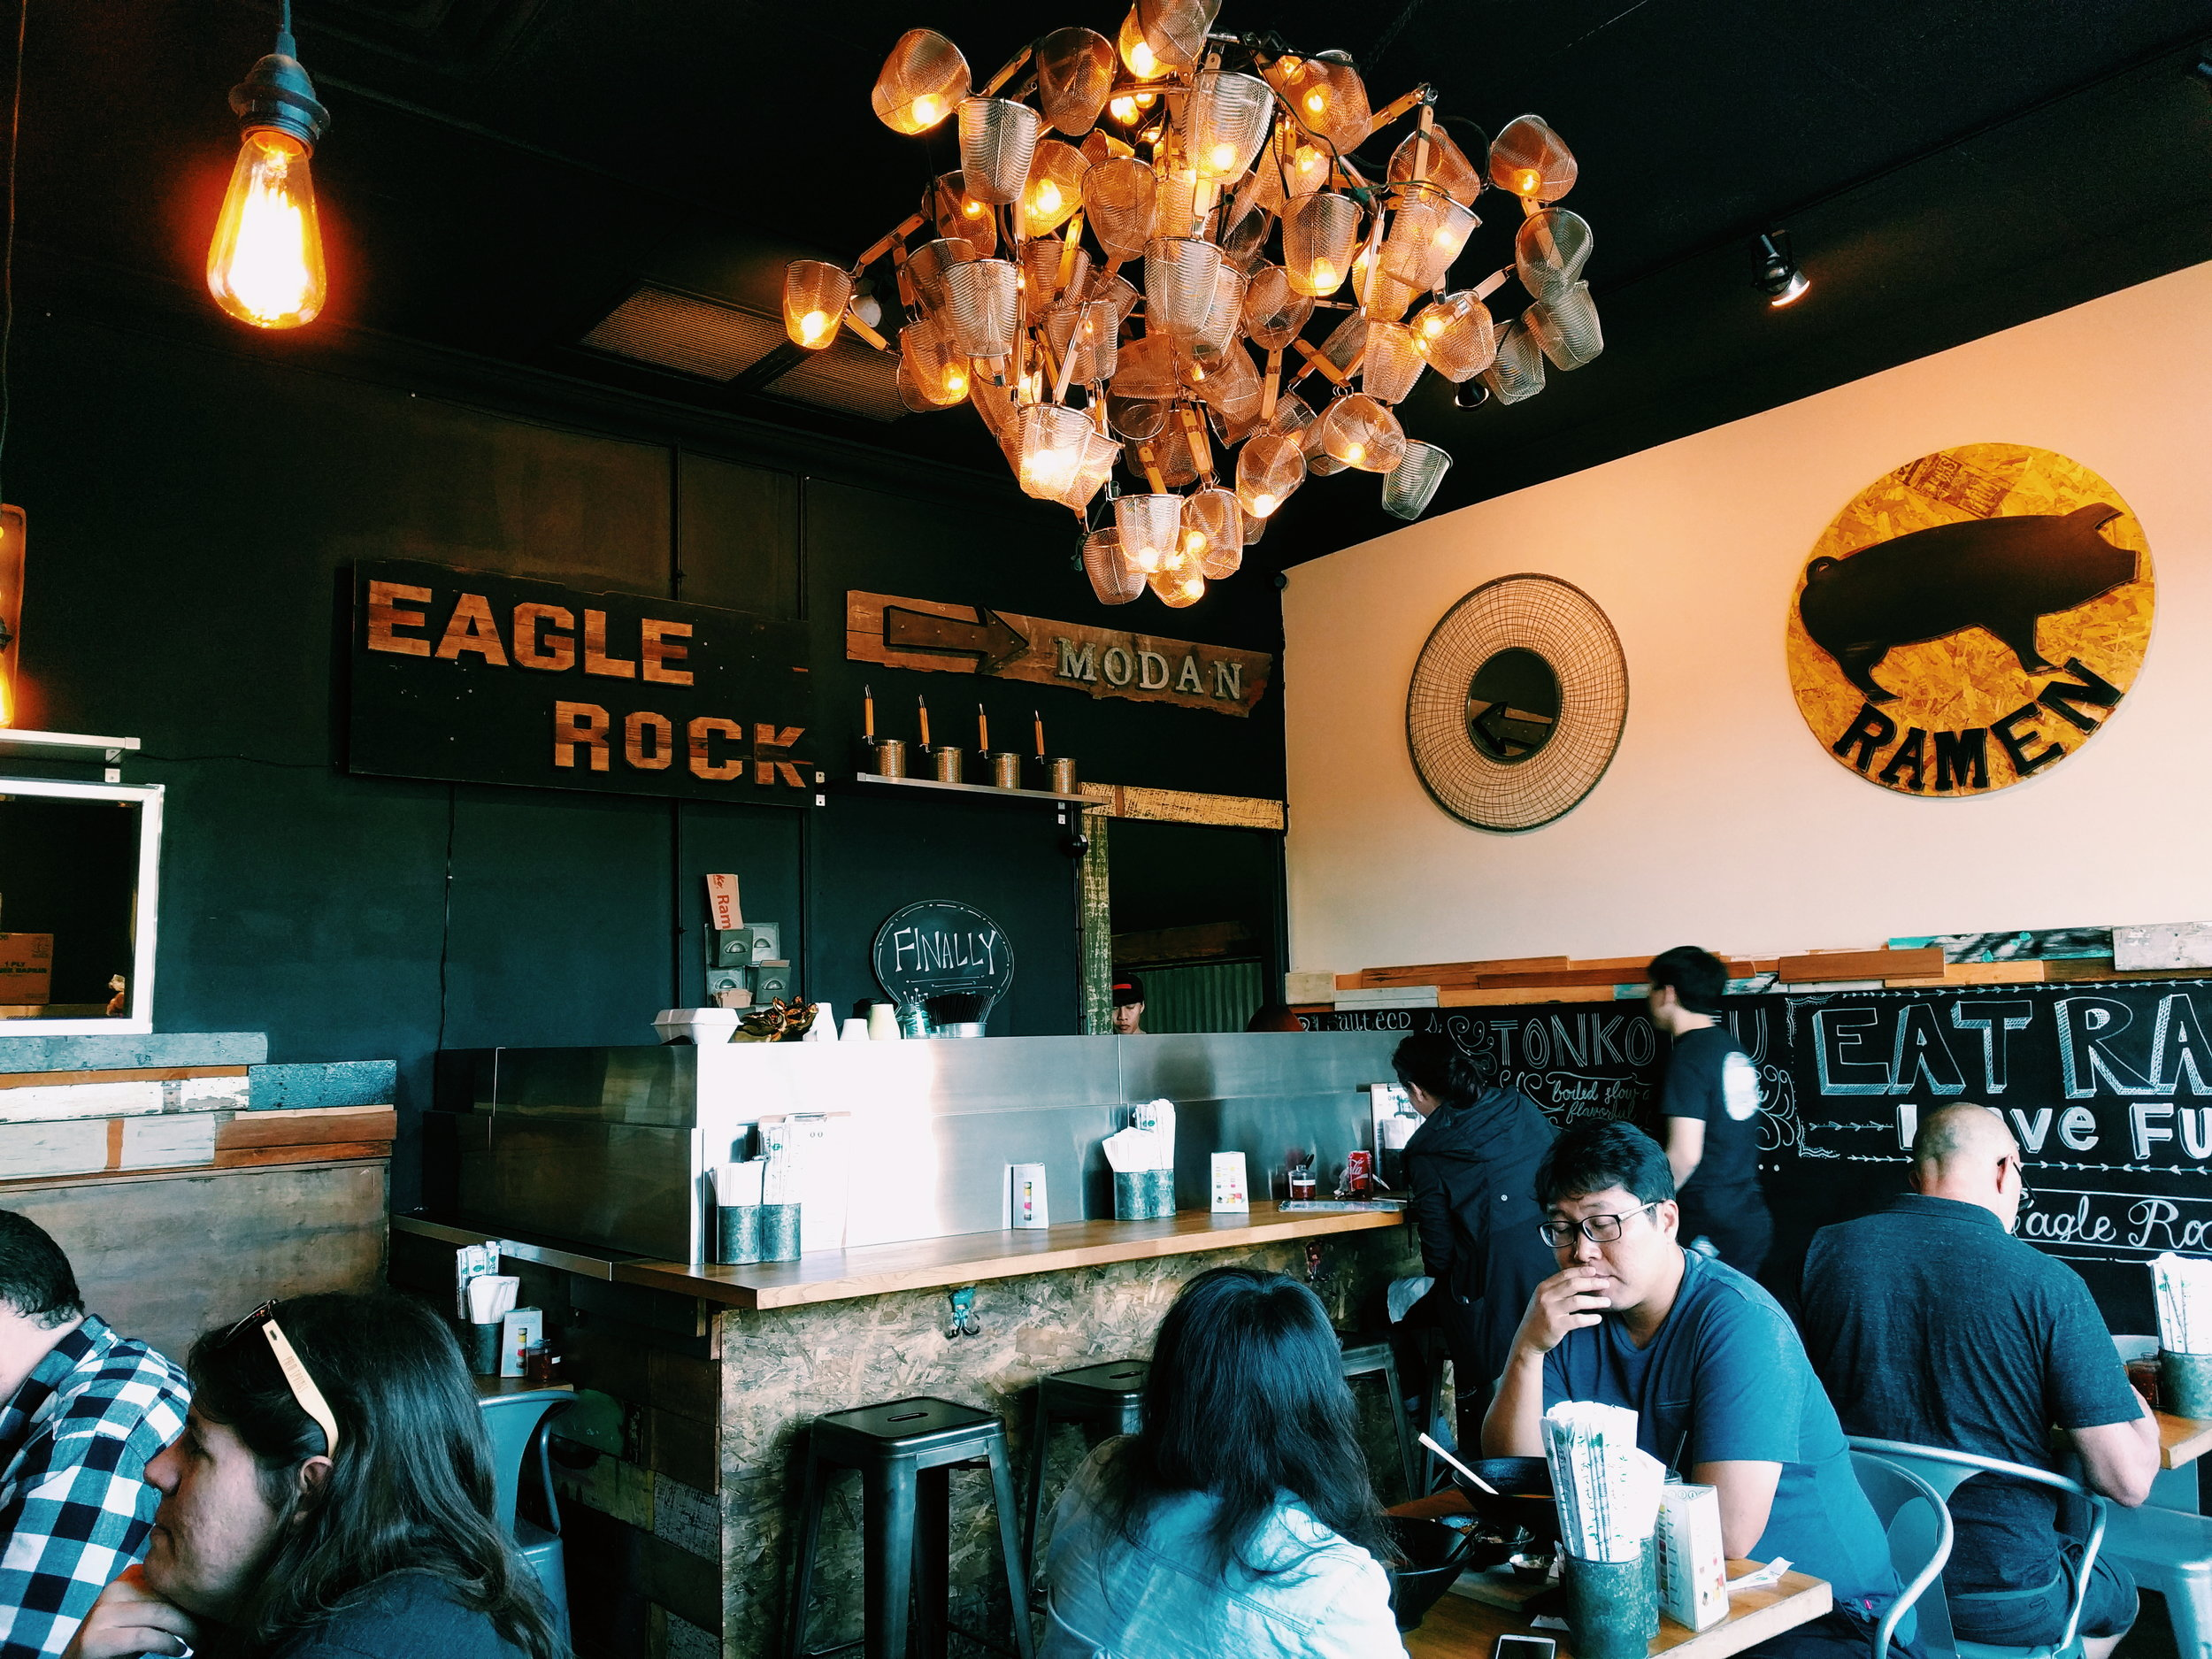 Modan Ramen Eagle Rock